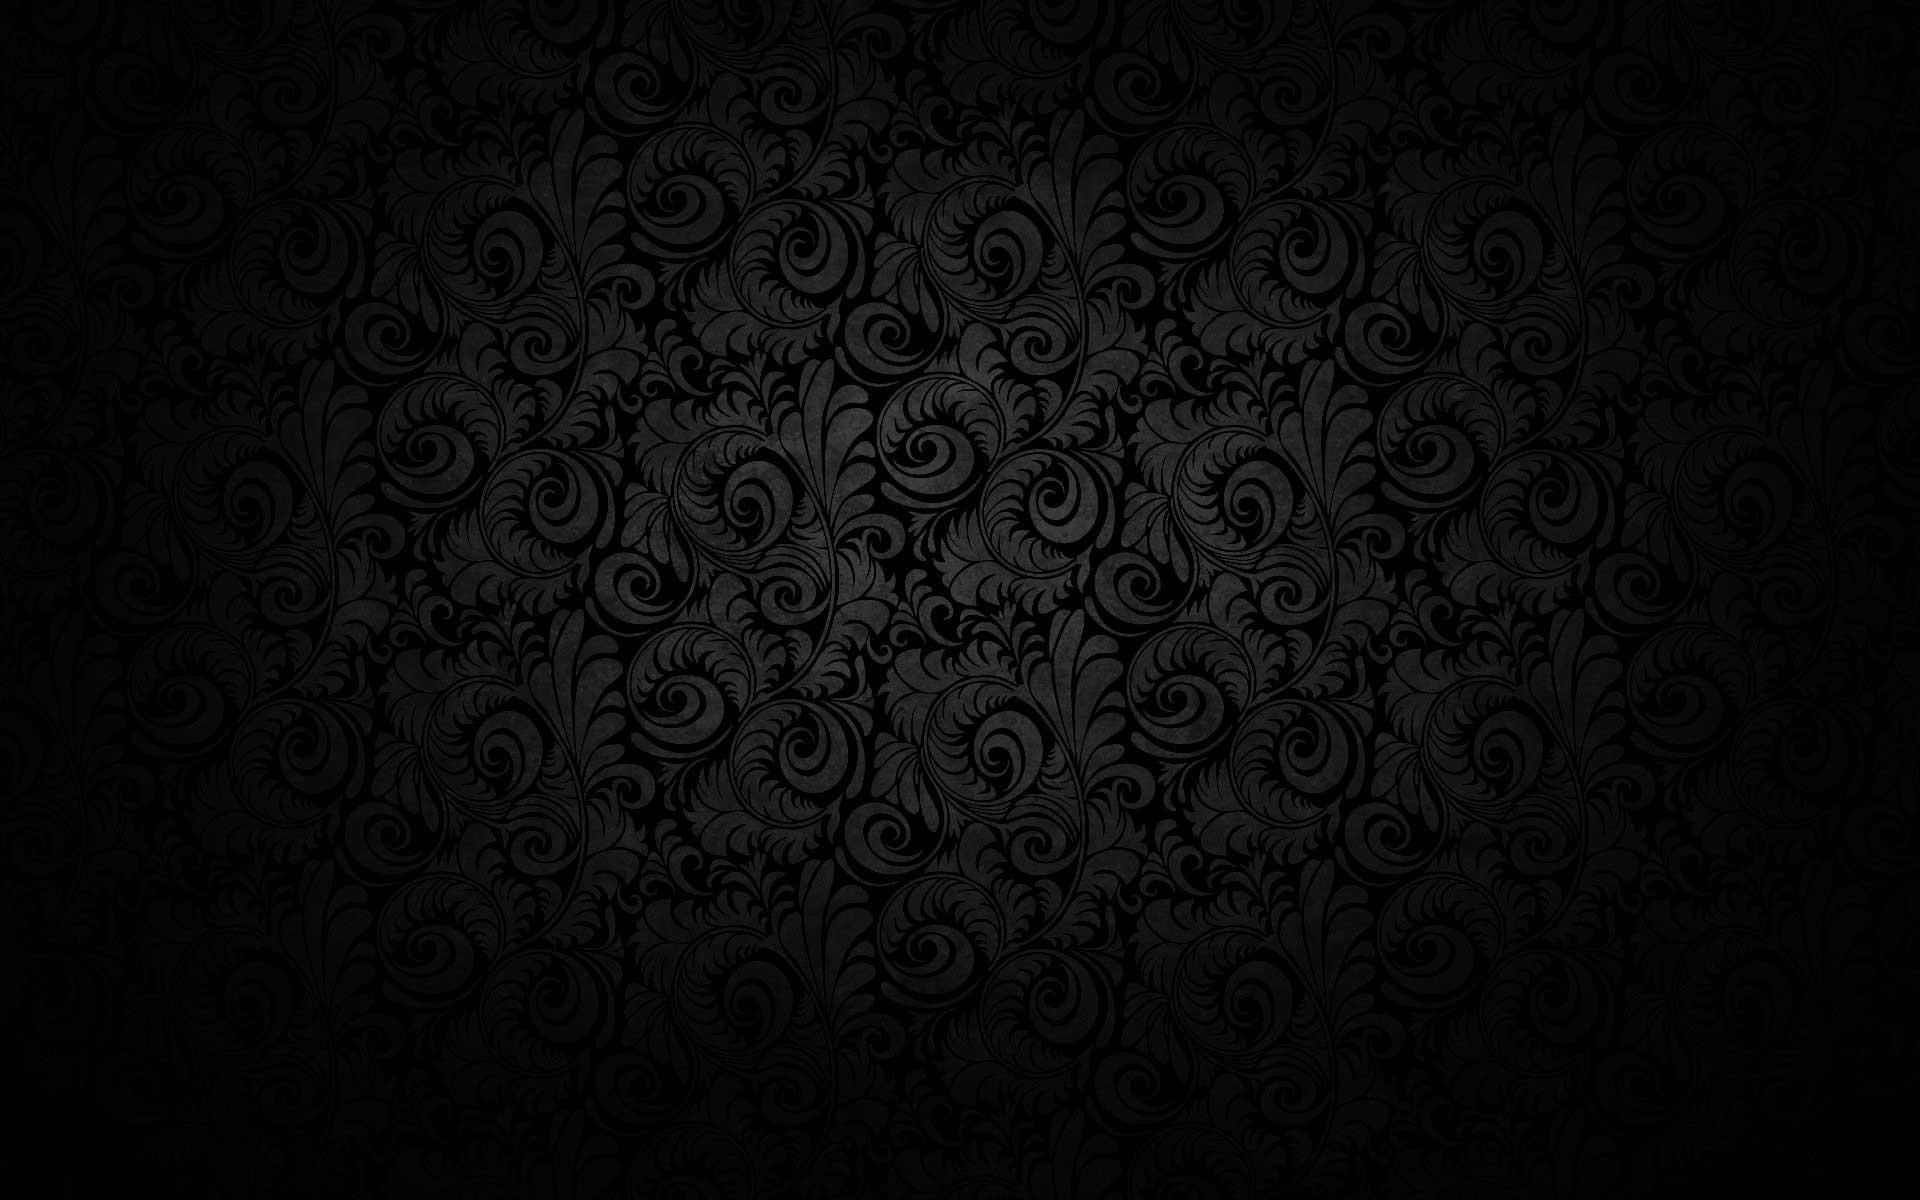 Black Invitation Background